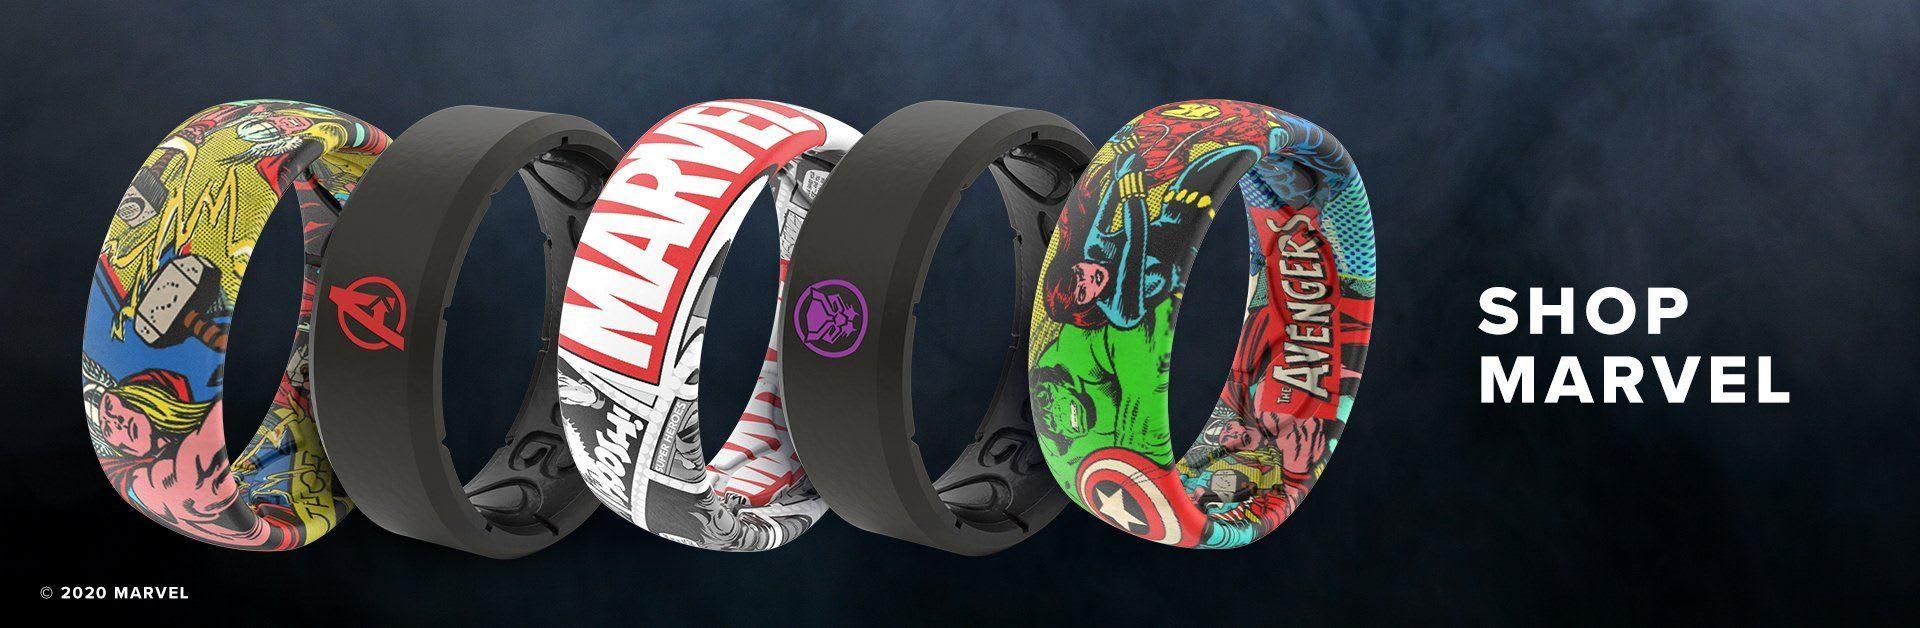 Shop Marvel, multiple Marvel rings overlaid on a dark background